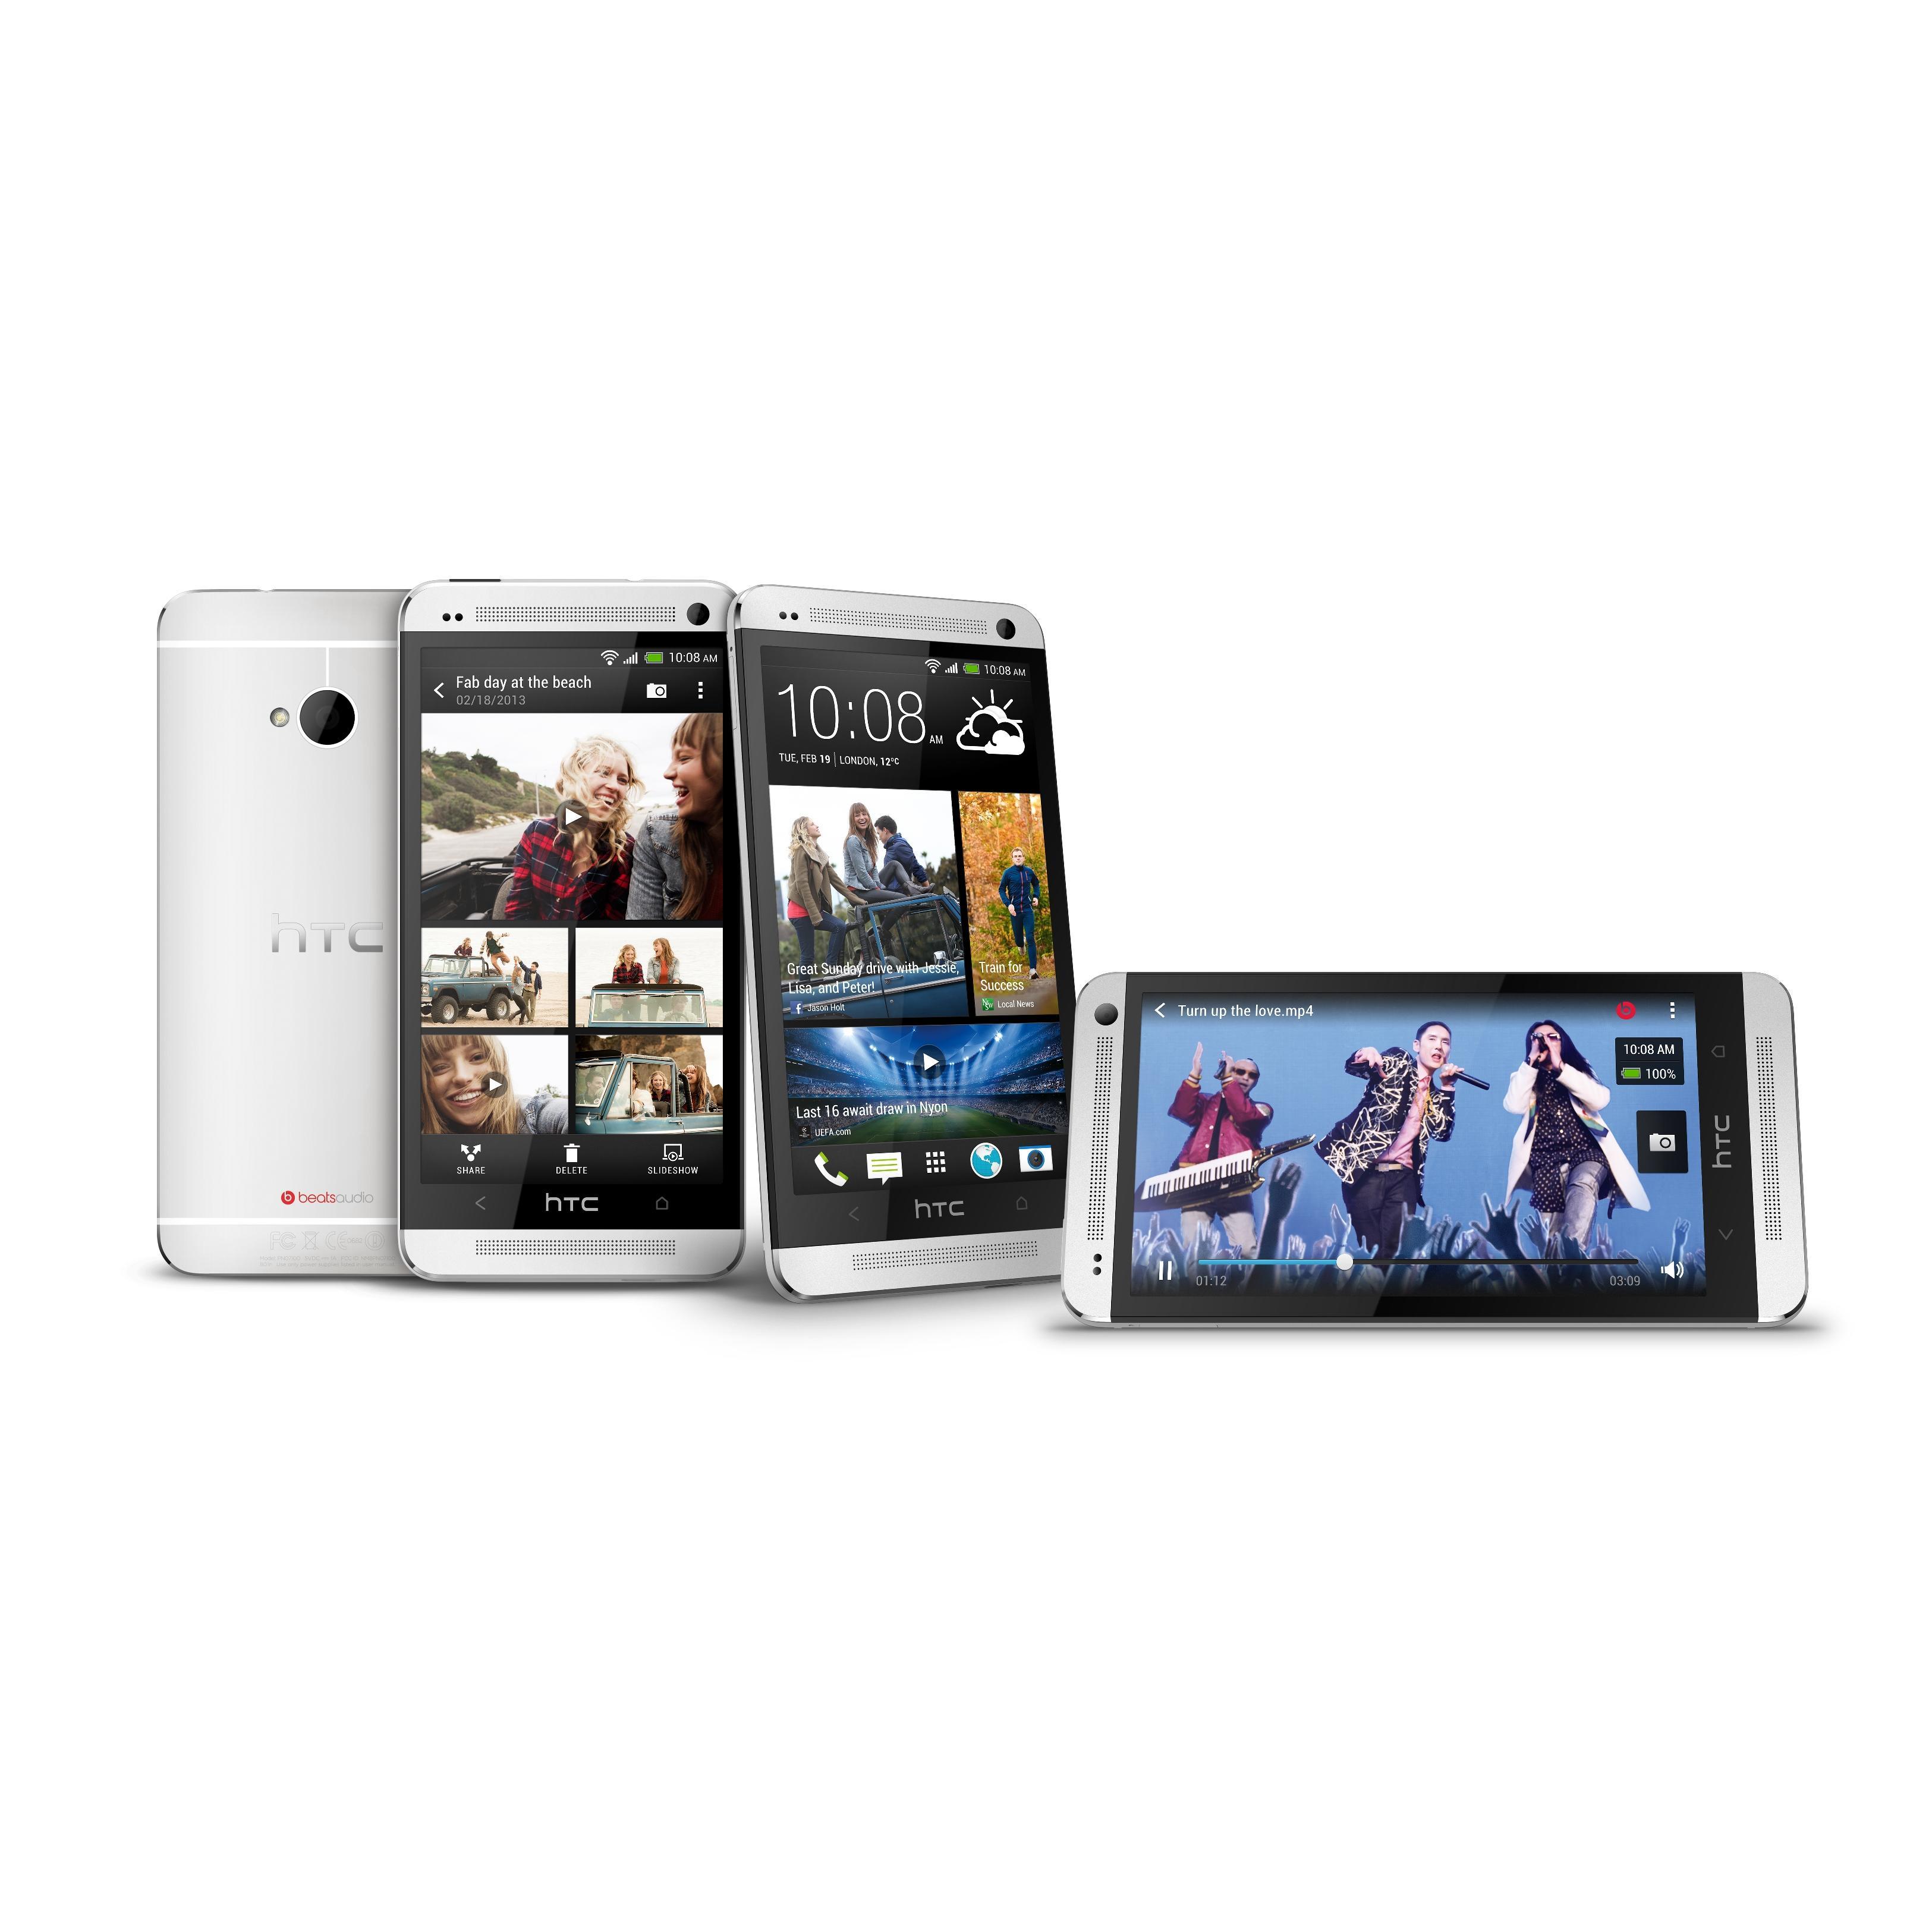 HTC One M7 32 GB - Plata - Libre